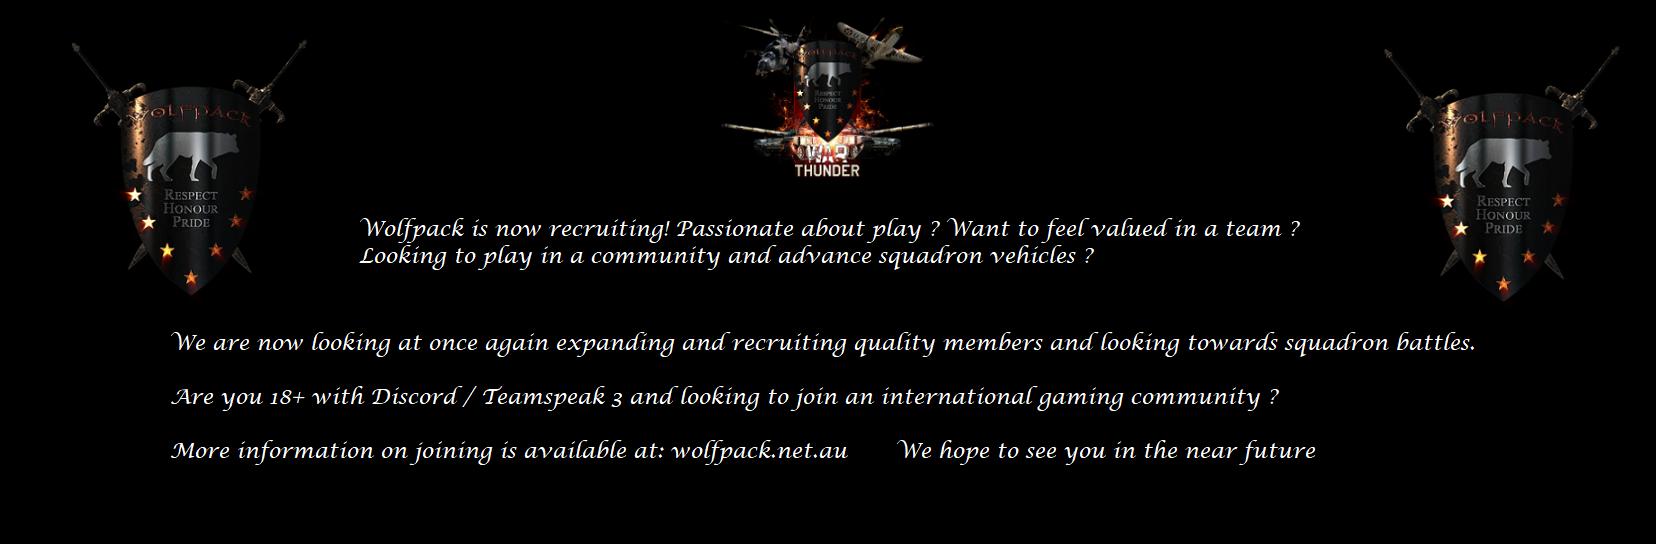 wolfpack-recruitment-logo.png